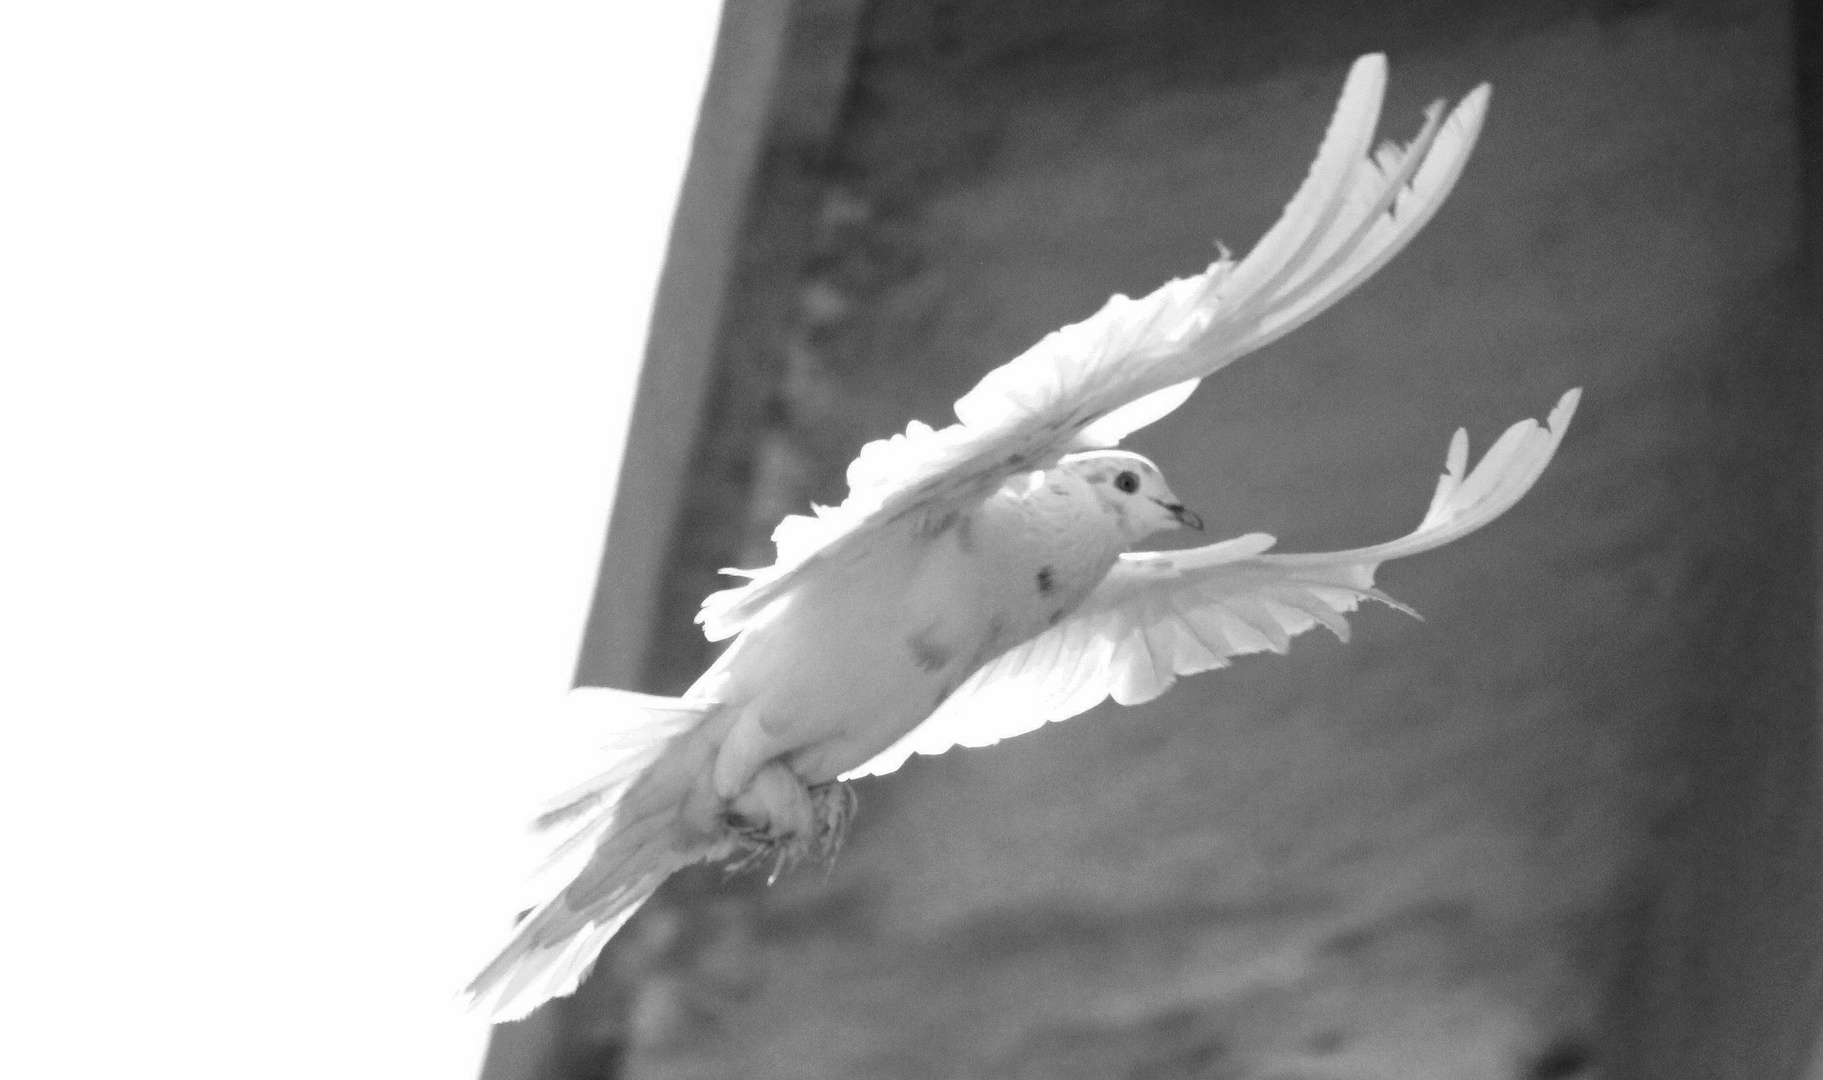 Masakali - A white pigeon :)